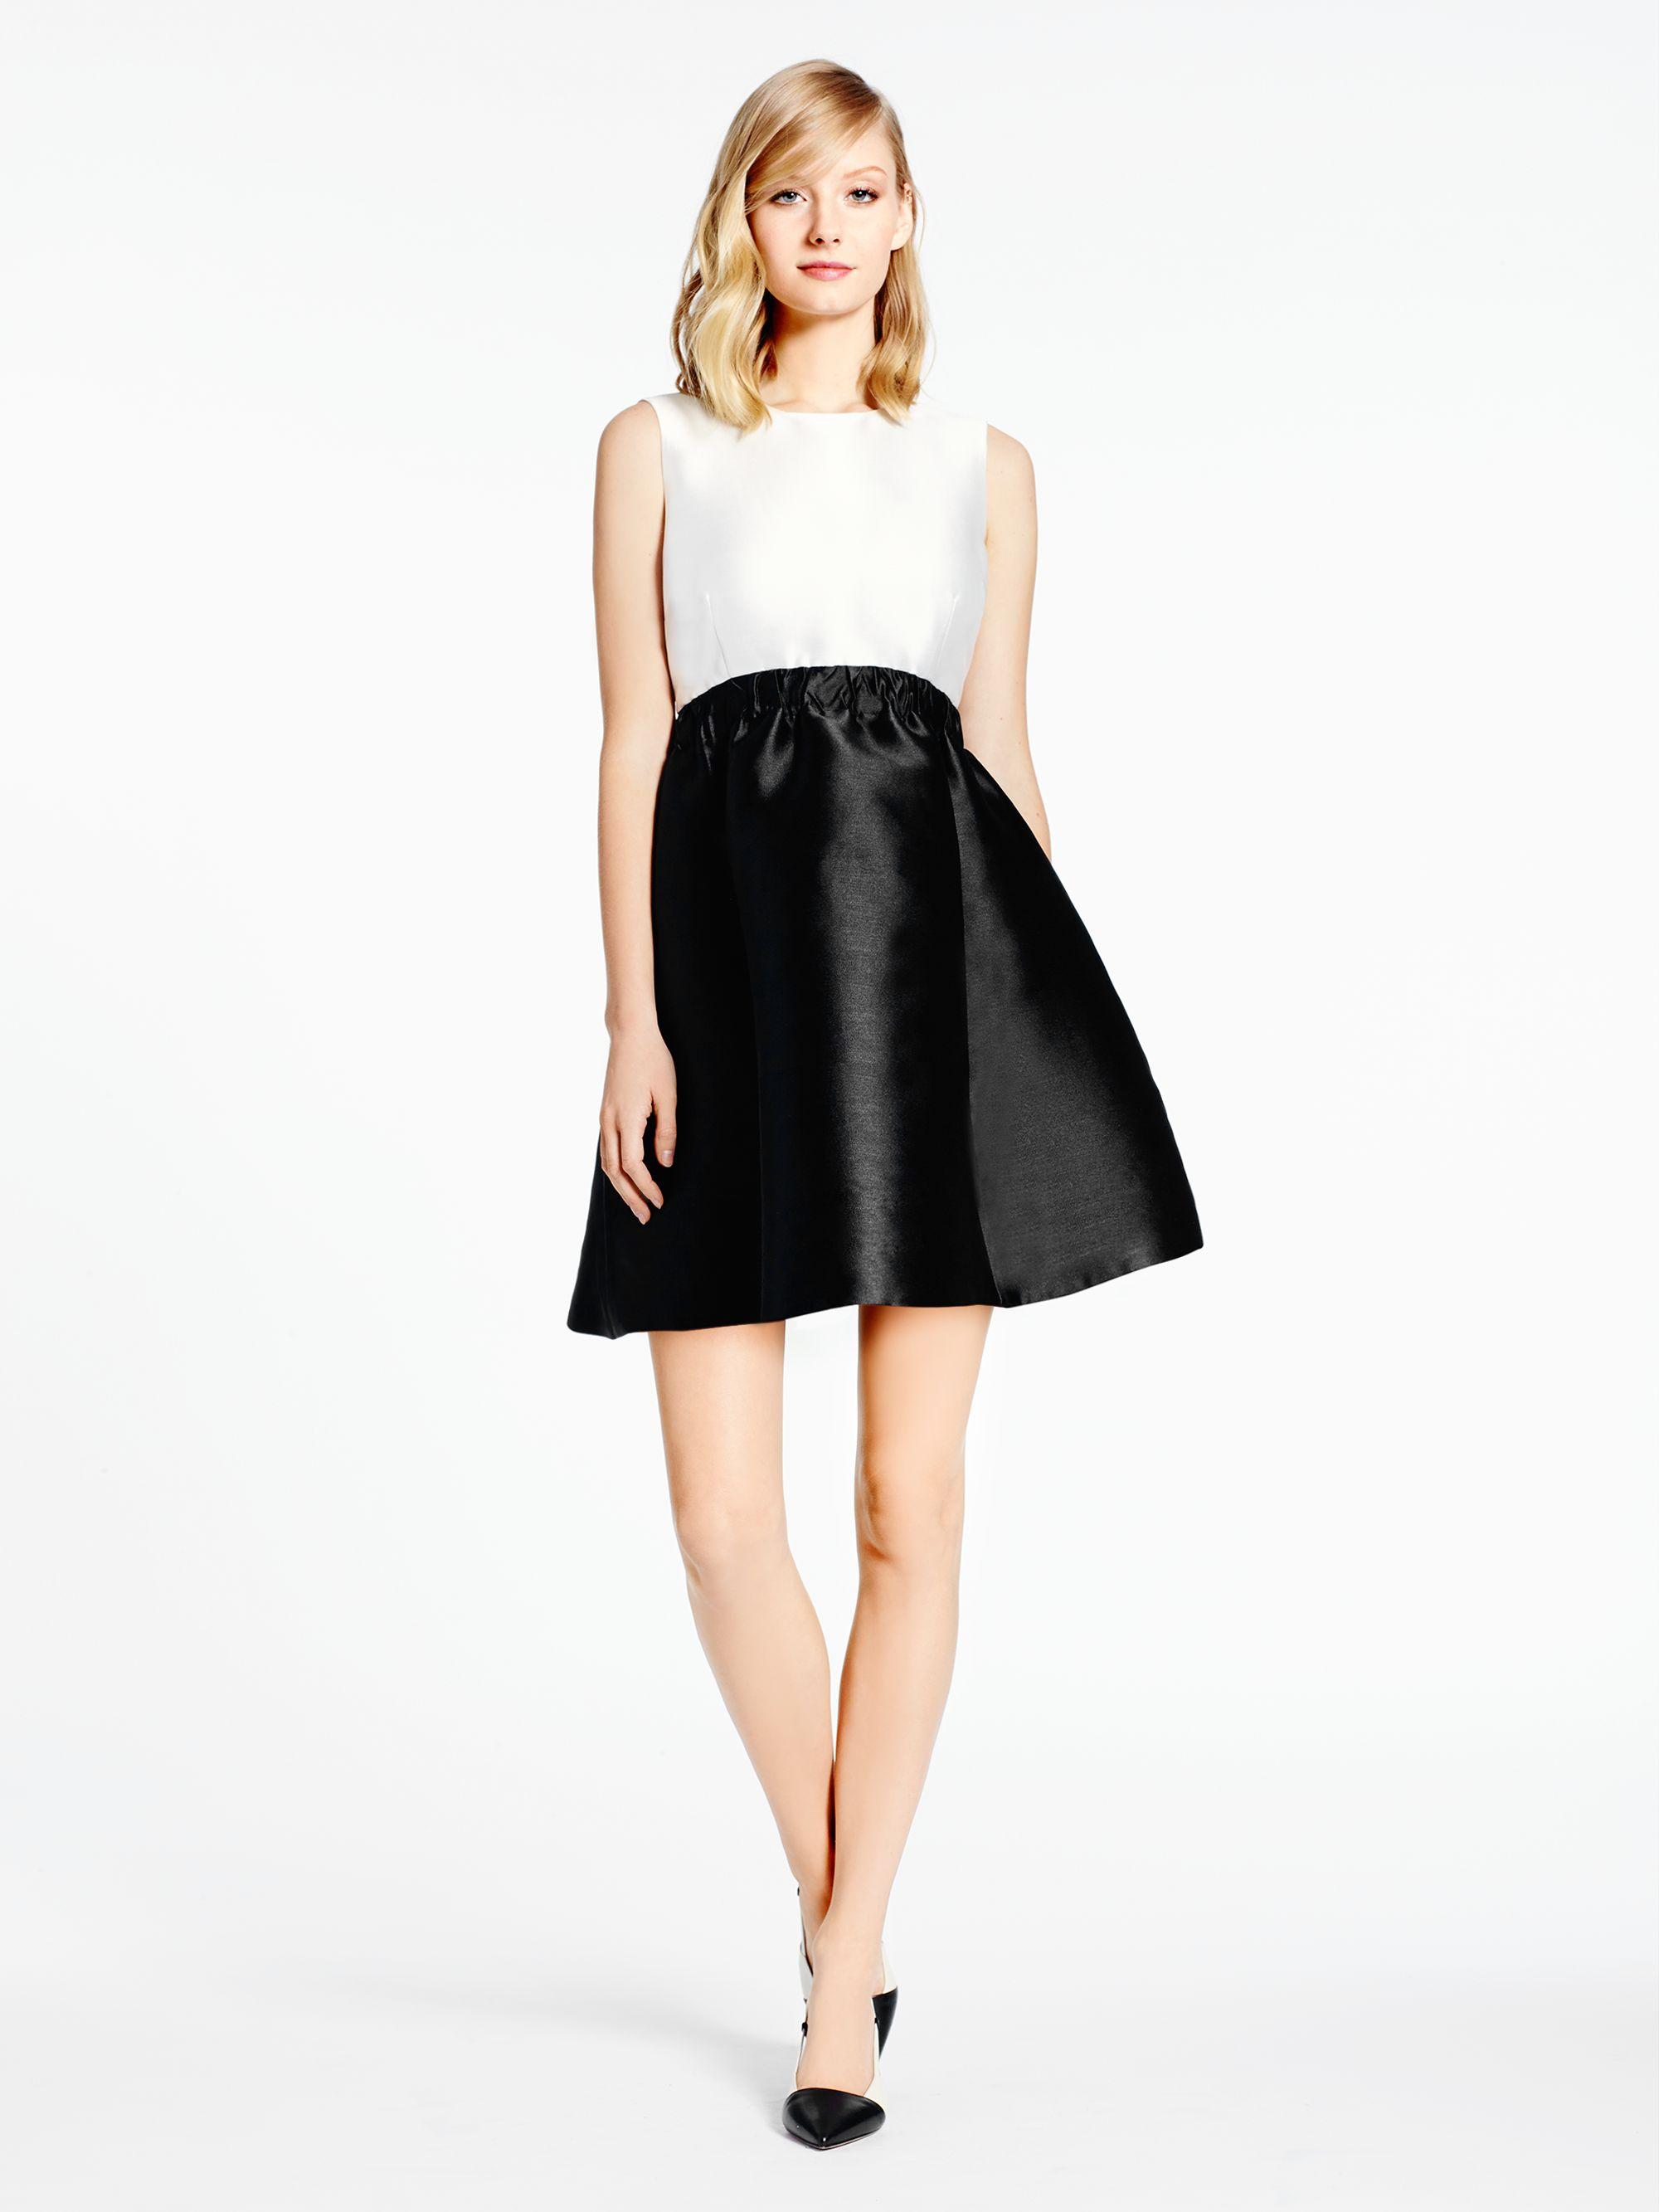 Lyst Kate Spade New York Swift Dress In Black